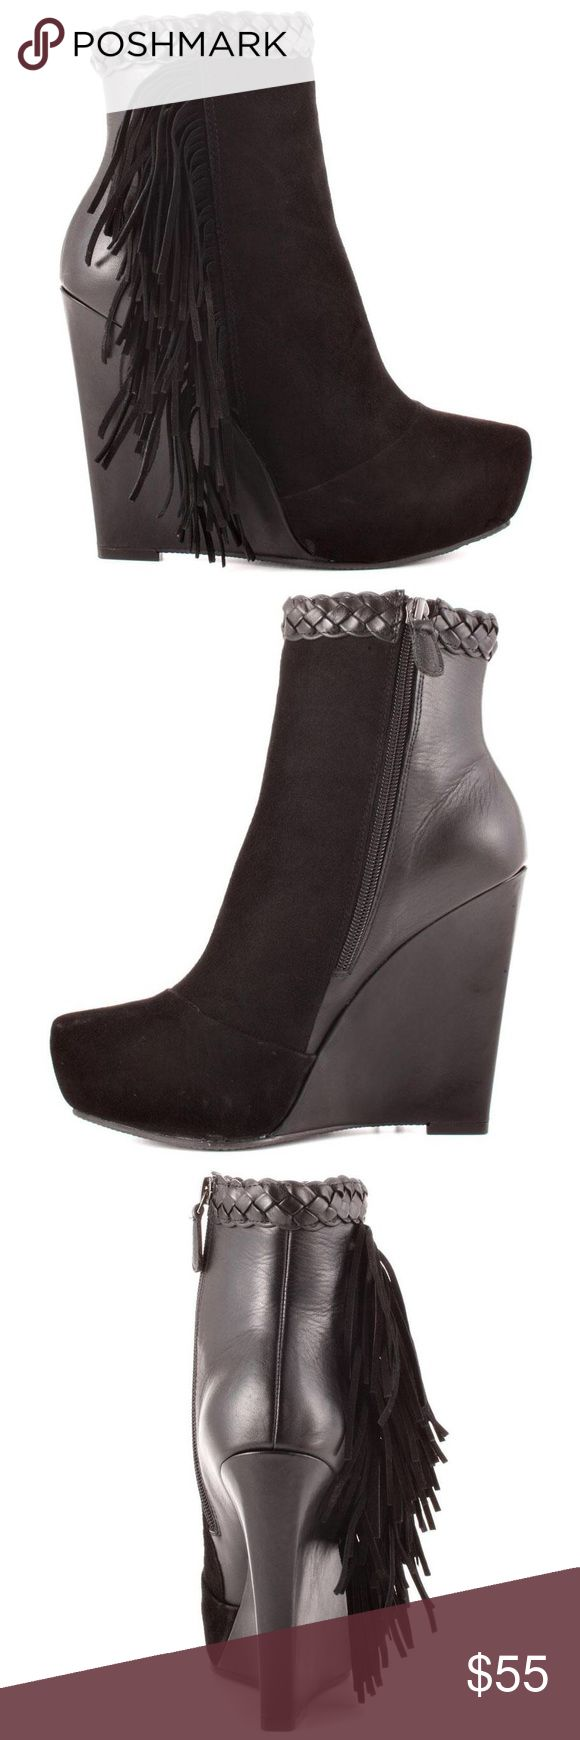 Boutique 9 Cerys Black Suede Wedge Ankle Boots Black Fringe detailing on outer sides of shoes, black suede & black leather mix, hidden platform. Worn once, looks like new! Boutique 9 Shoes Wedges